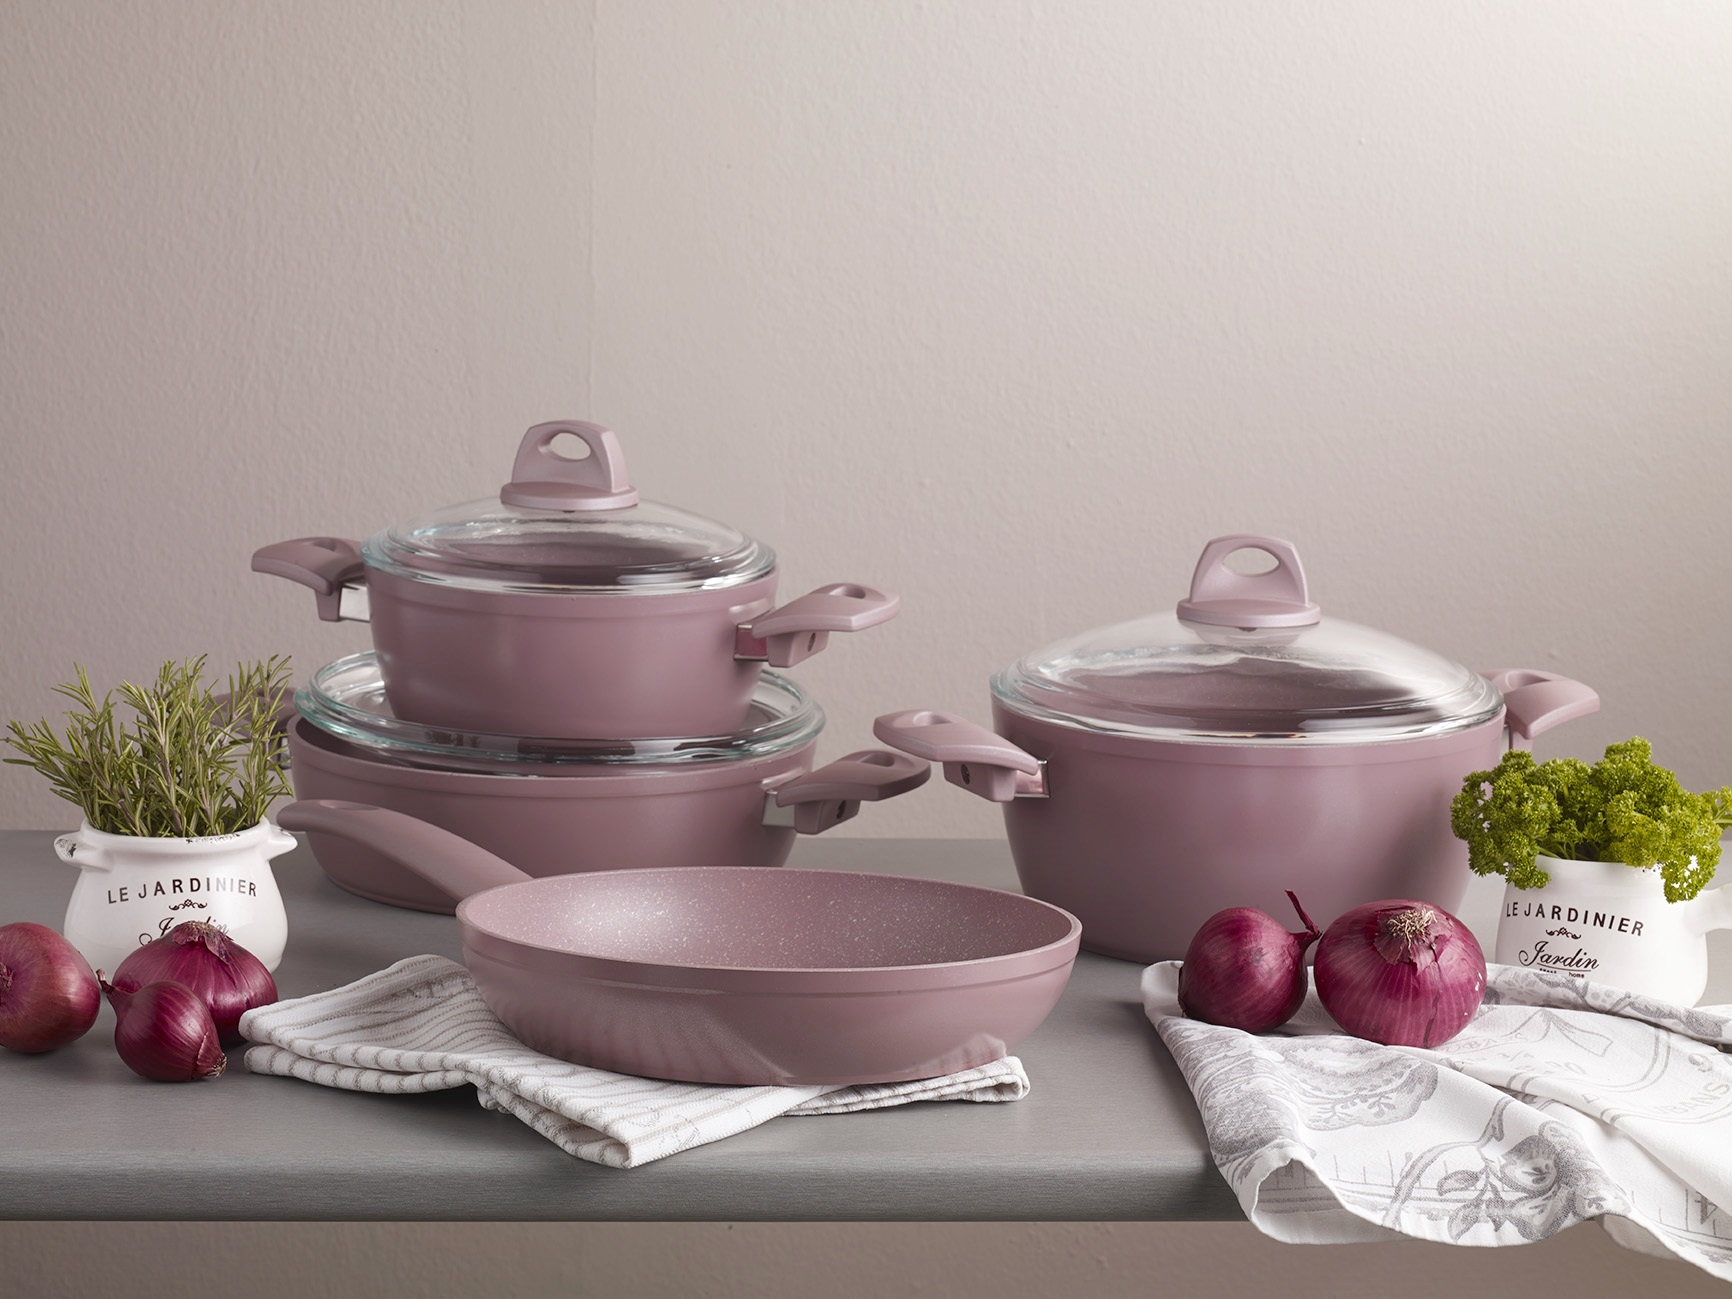 Шикарный набор мраморной посуды Pierre Cardin